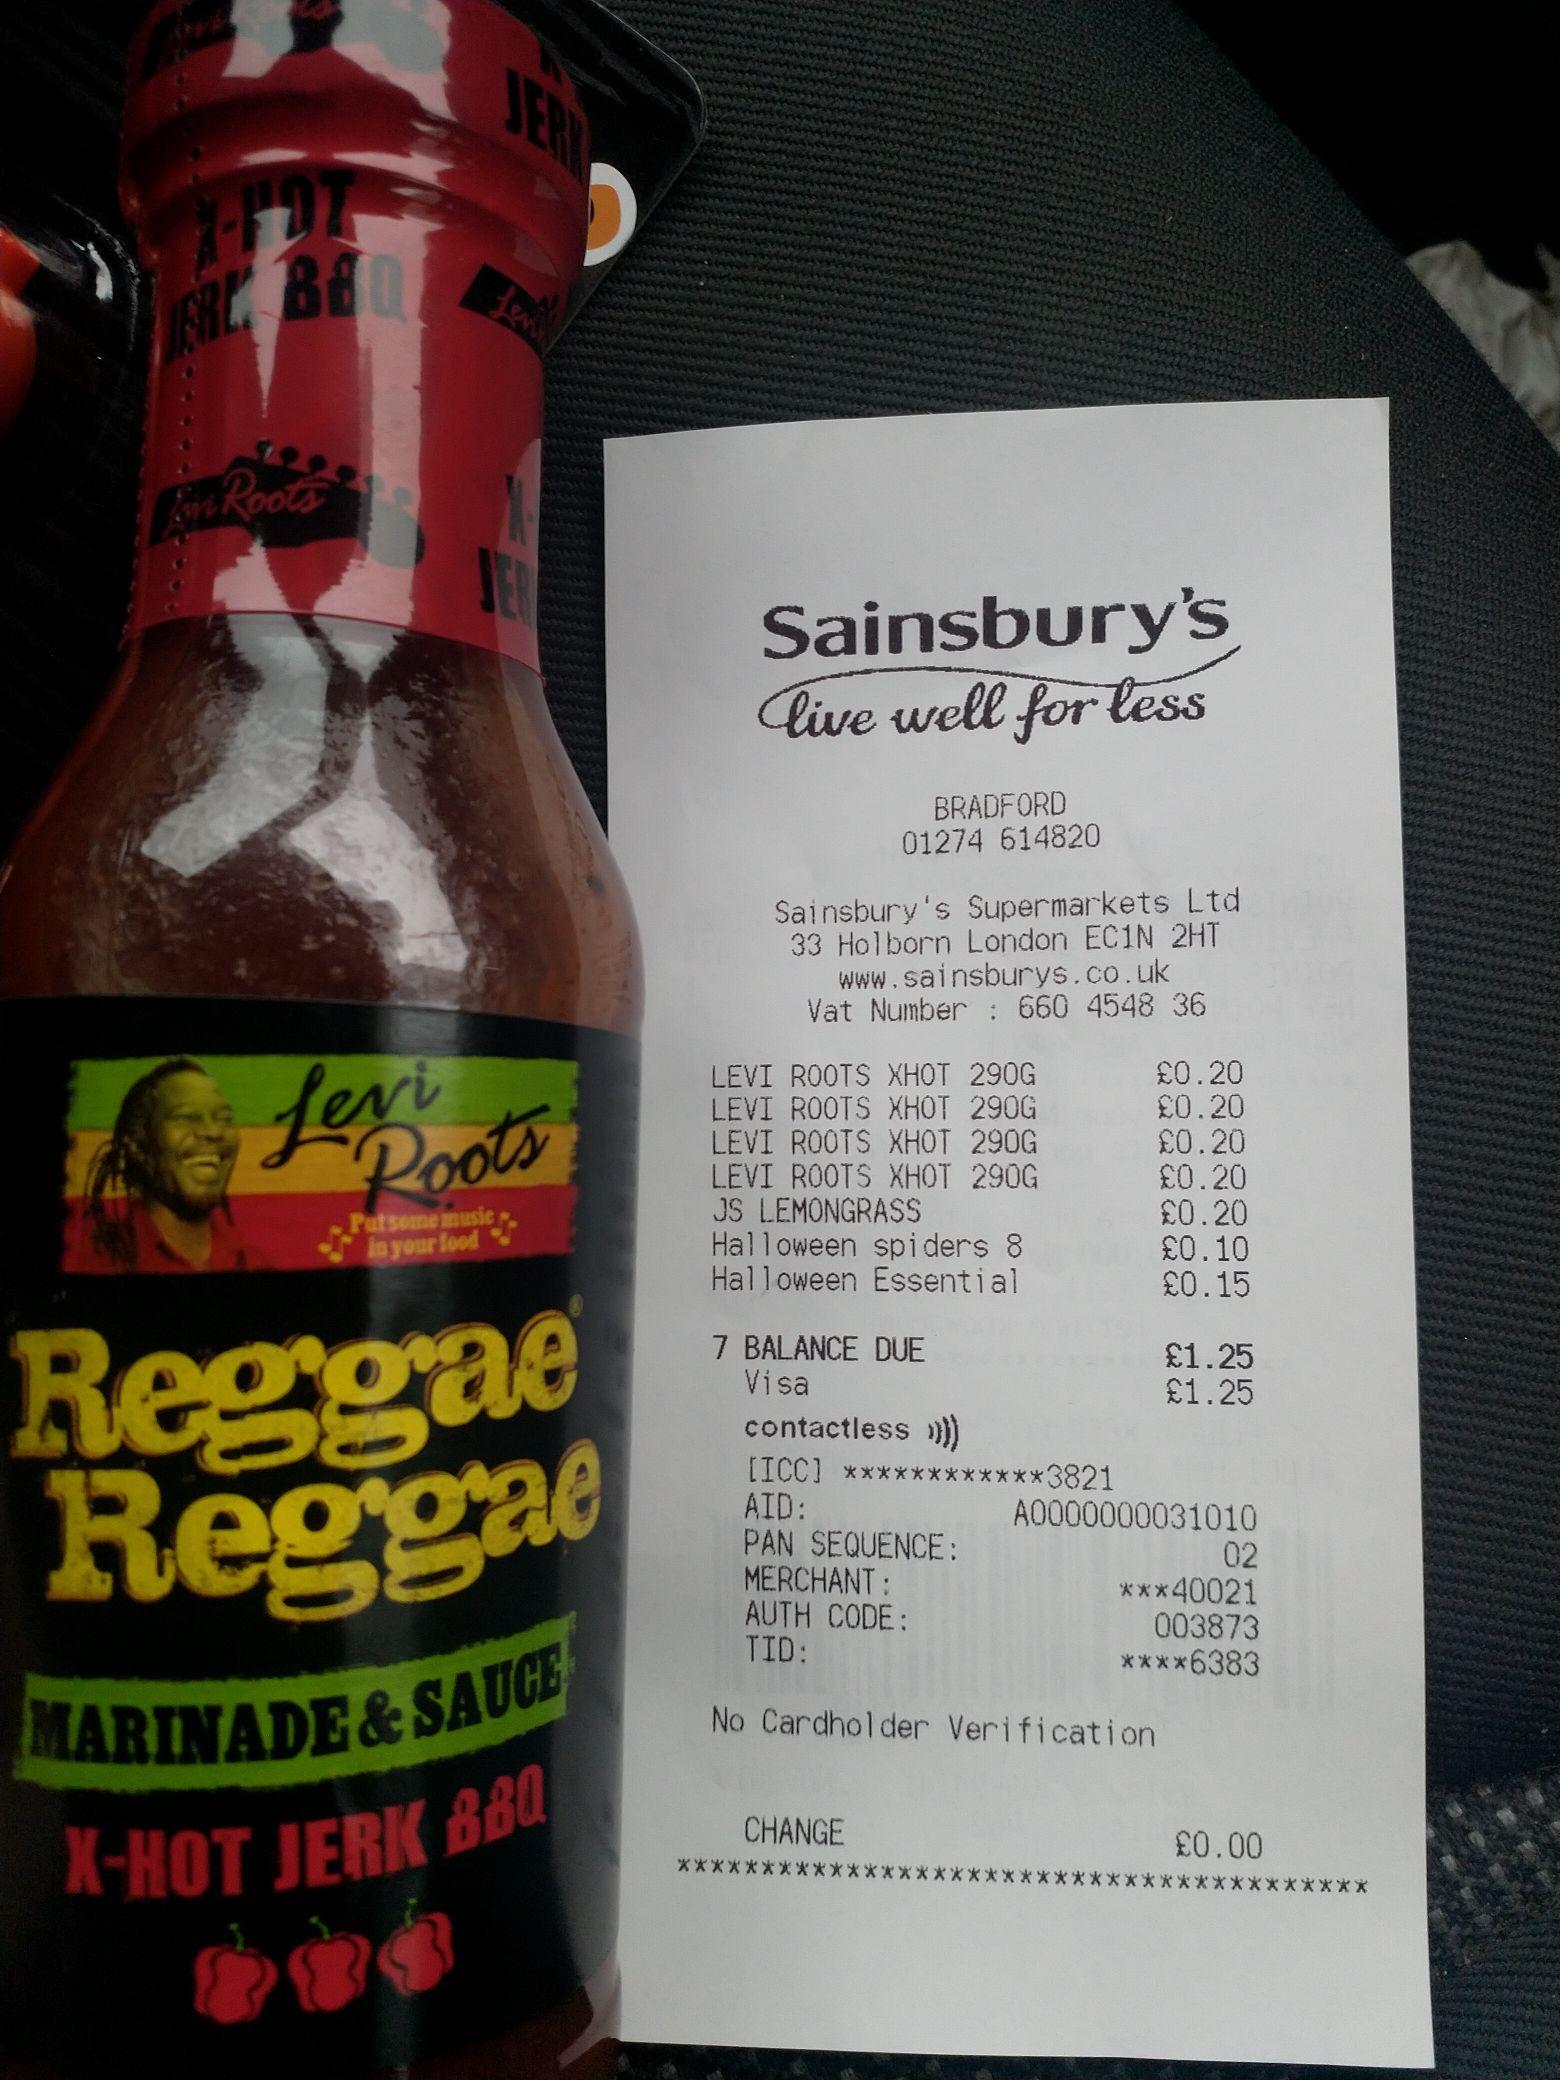 Levi Roots Reggae Reggae sauce X HOT 20p @ Sainsbury's